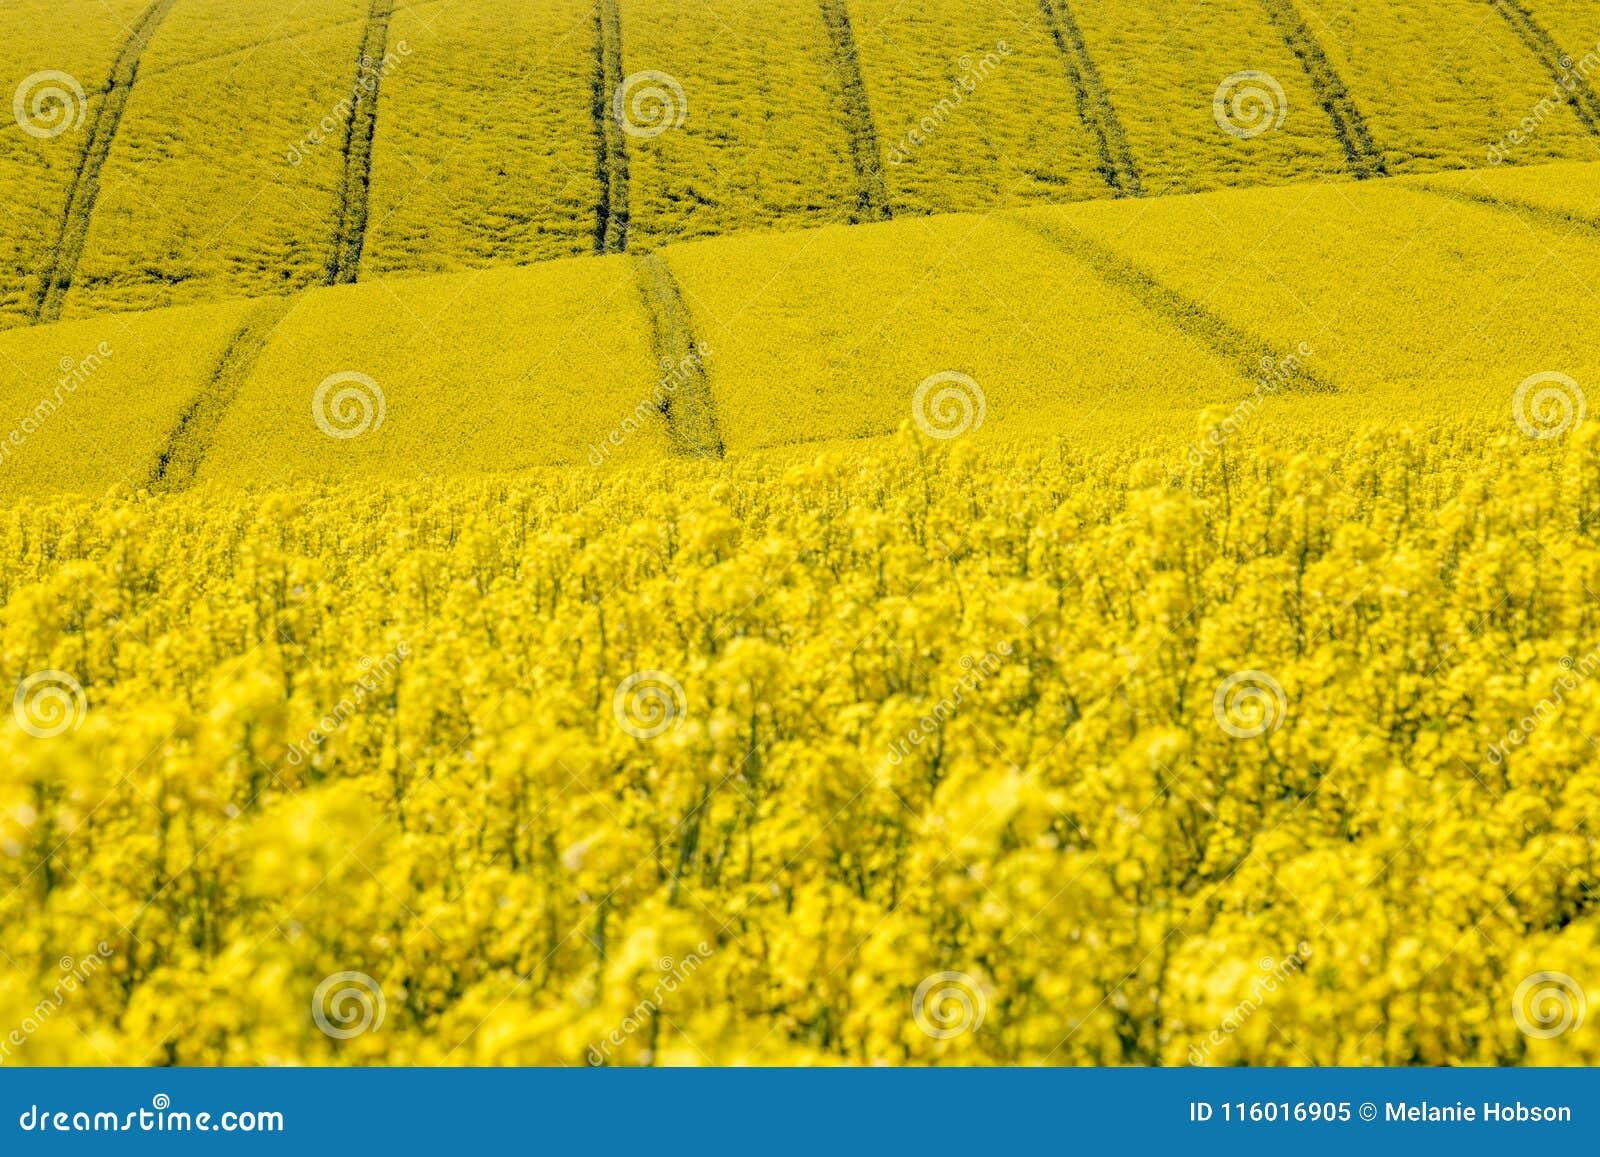 Yellow canolarapeseed flowers stock image image of crops yellow canolarapeseed flowers mightylinksfo